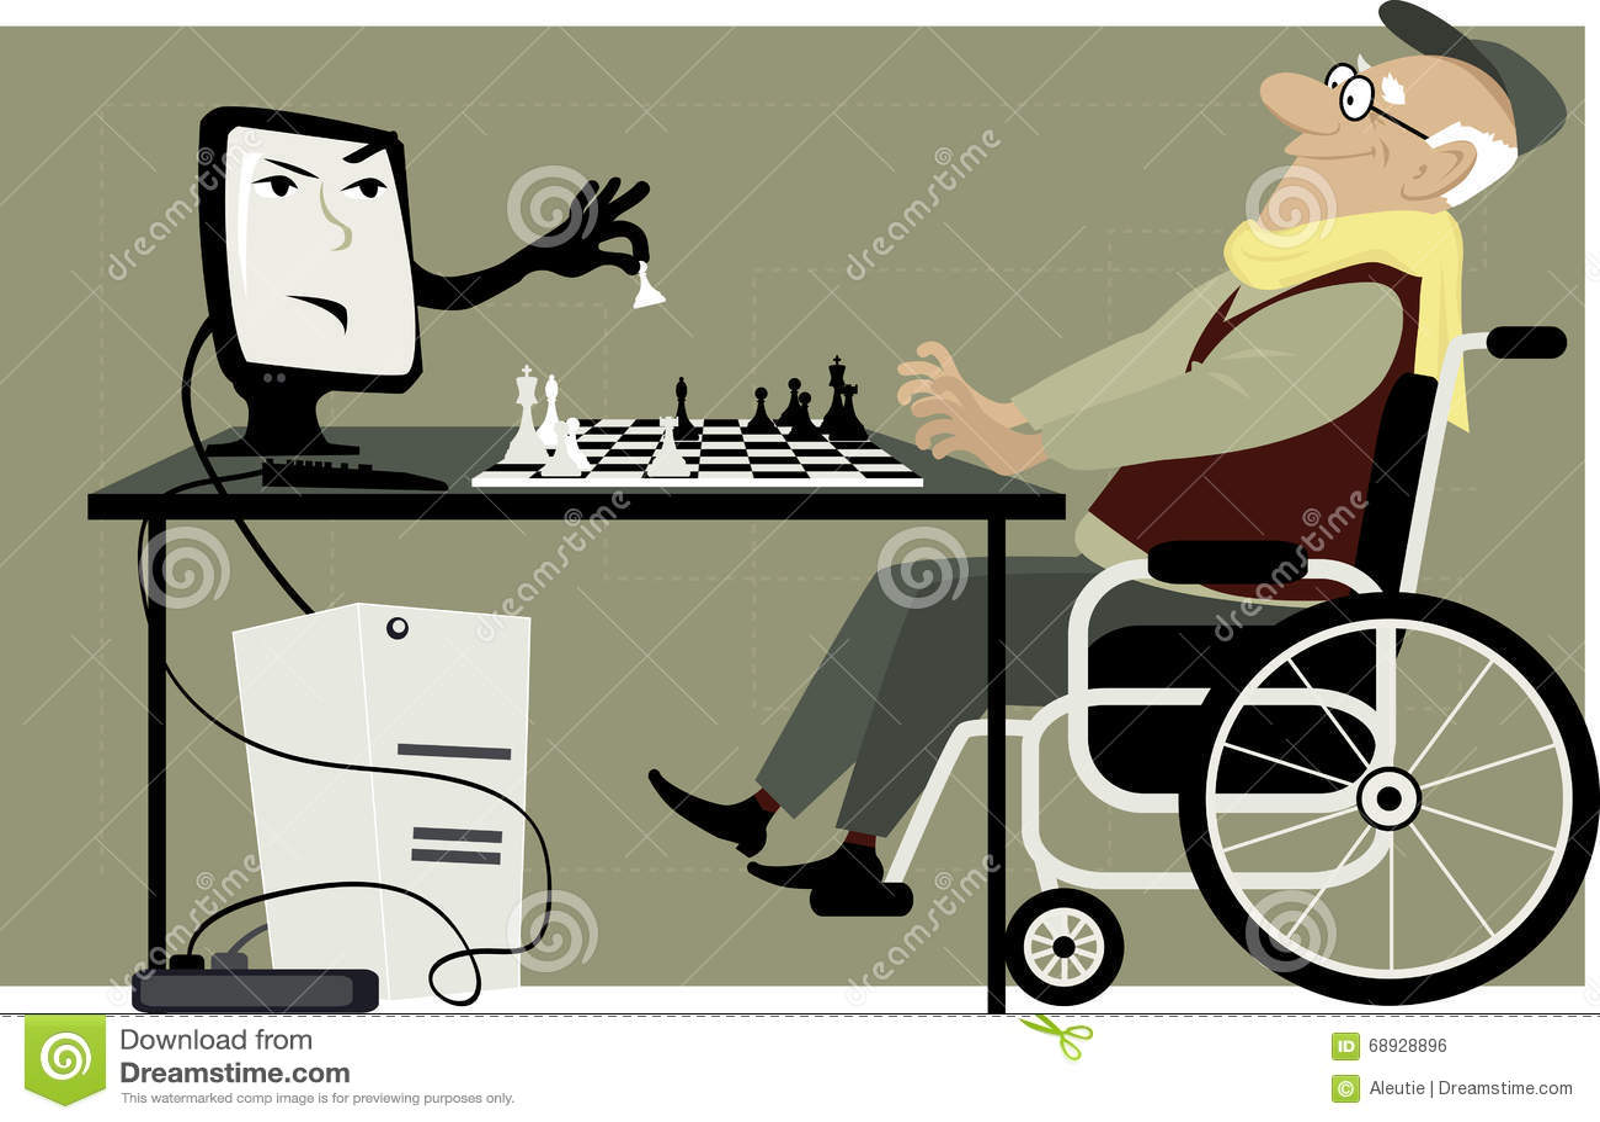 https://www.chess.com/play/computer